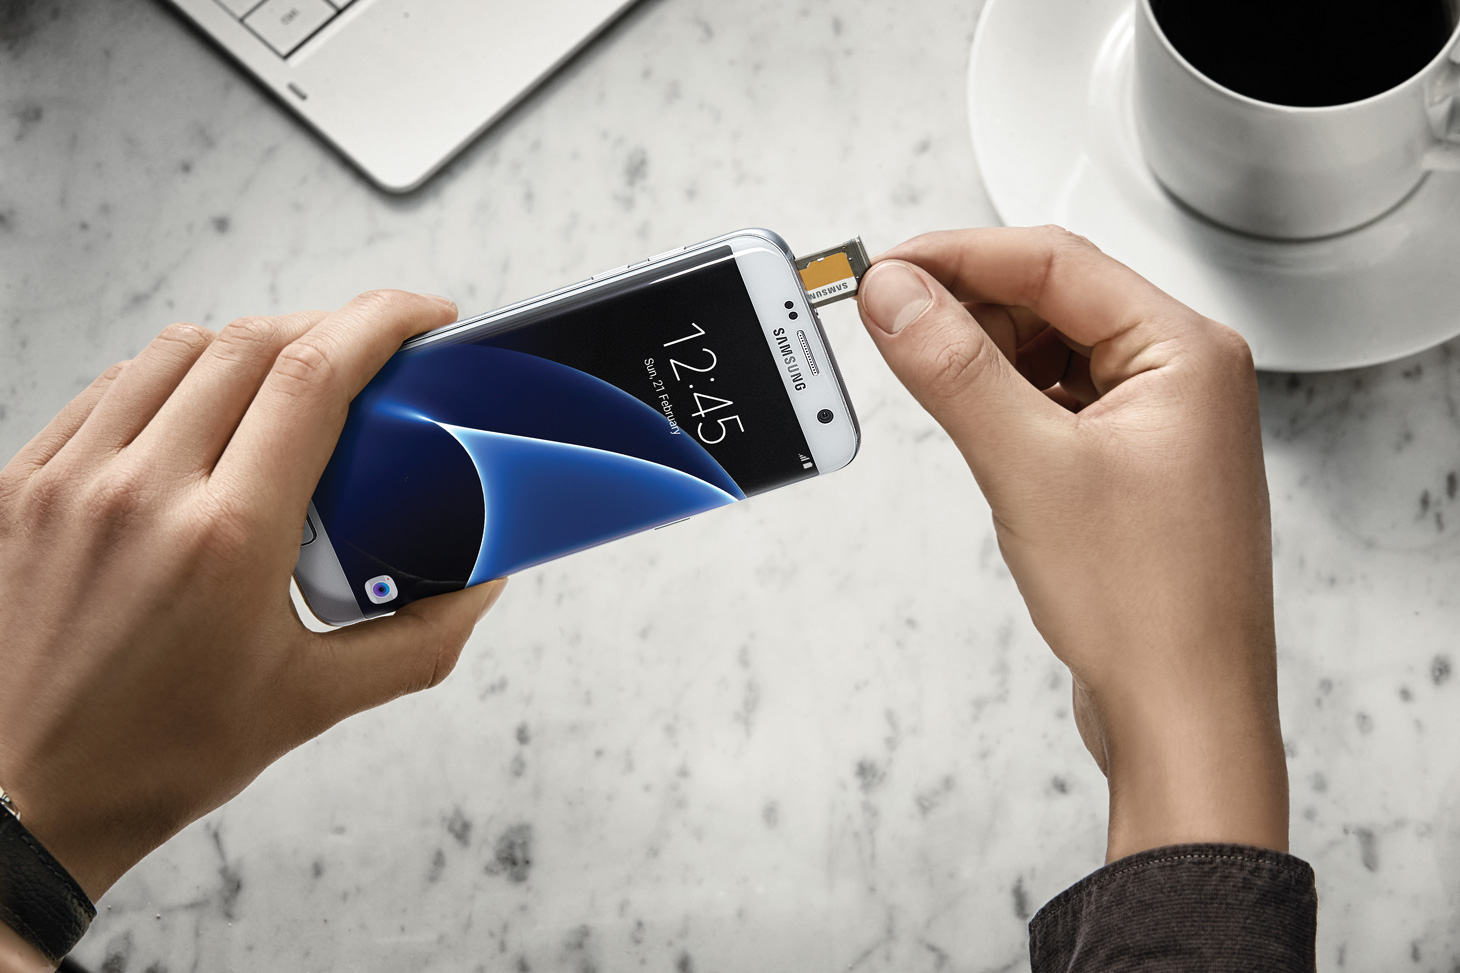 Samsung Galaxy S7 Sd Karte.Best Micro Sd Cards For Galaxy S7 S7 Edge Mobile Fun Blog